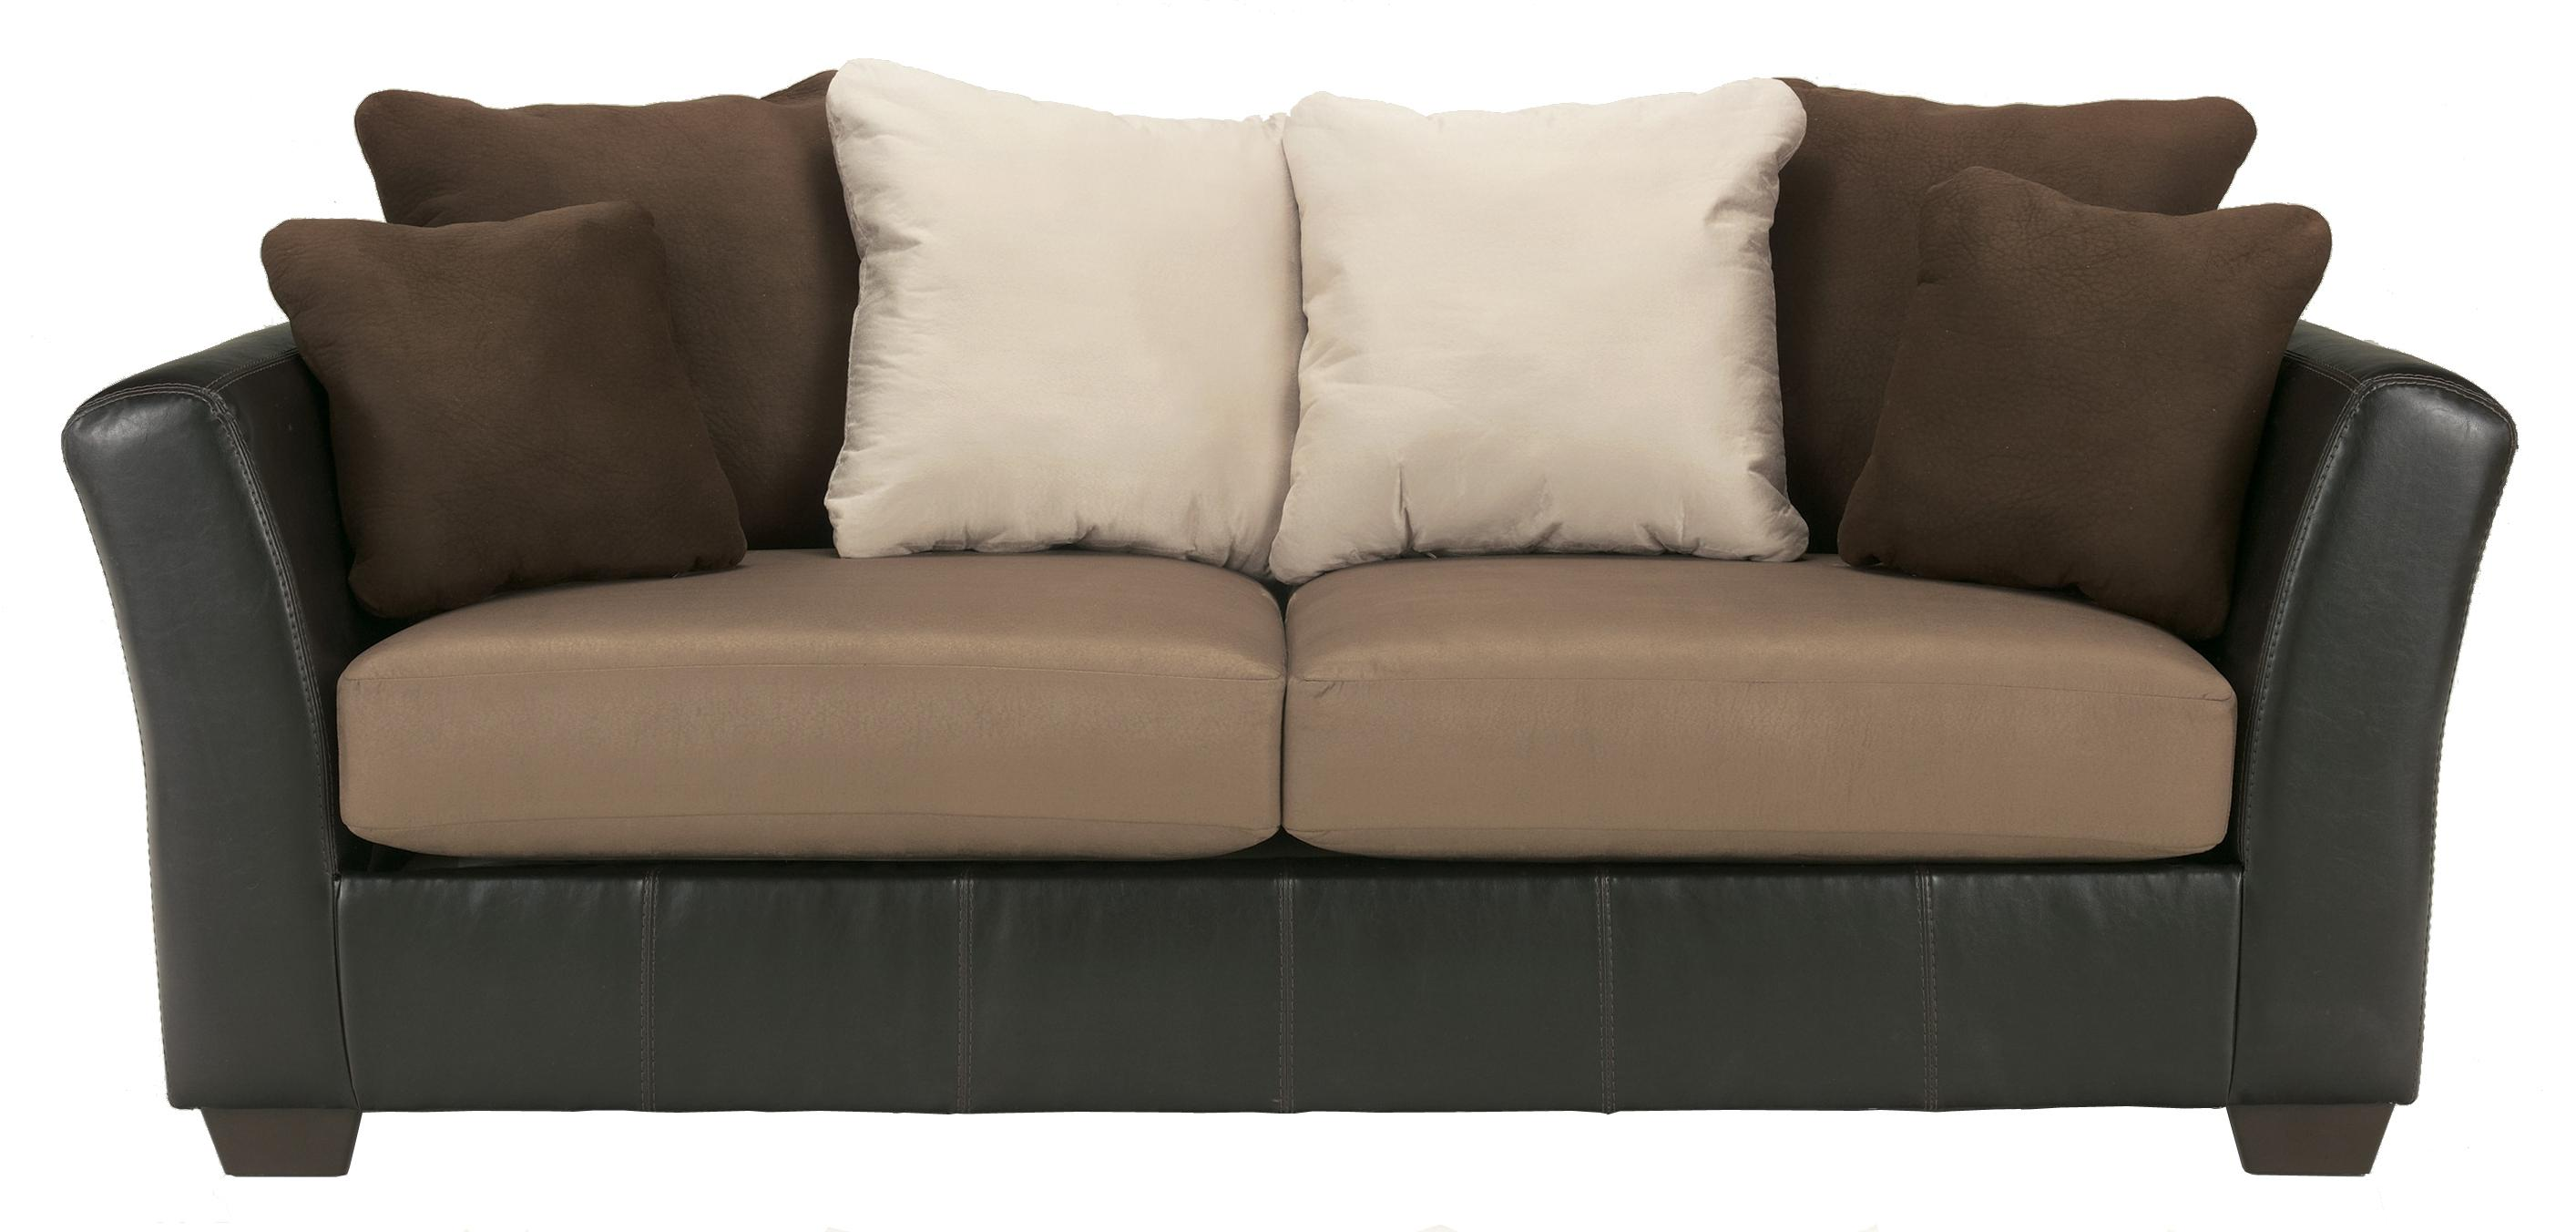 Ashley/Benchcraft Masoli - Mocha Sofa - Item Number: 1420138